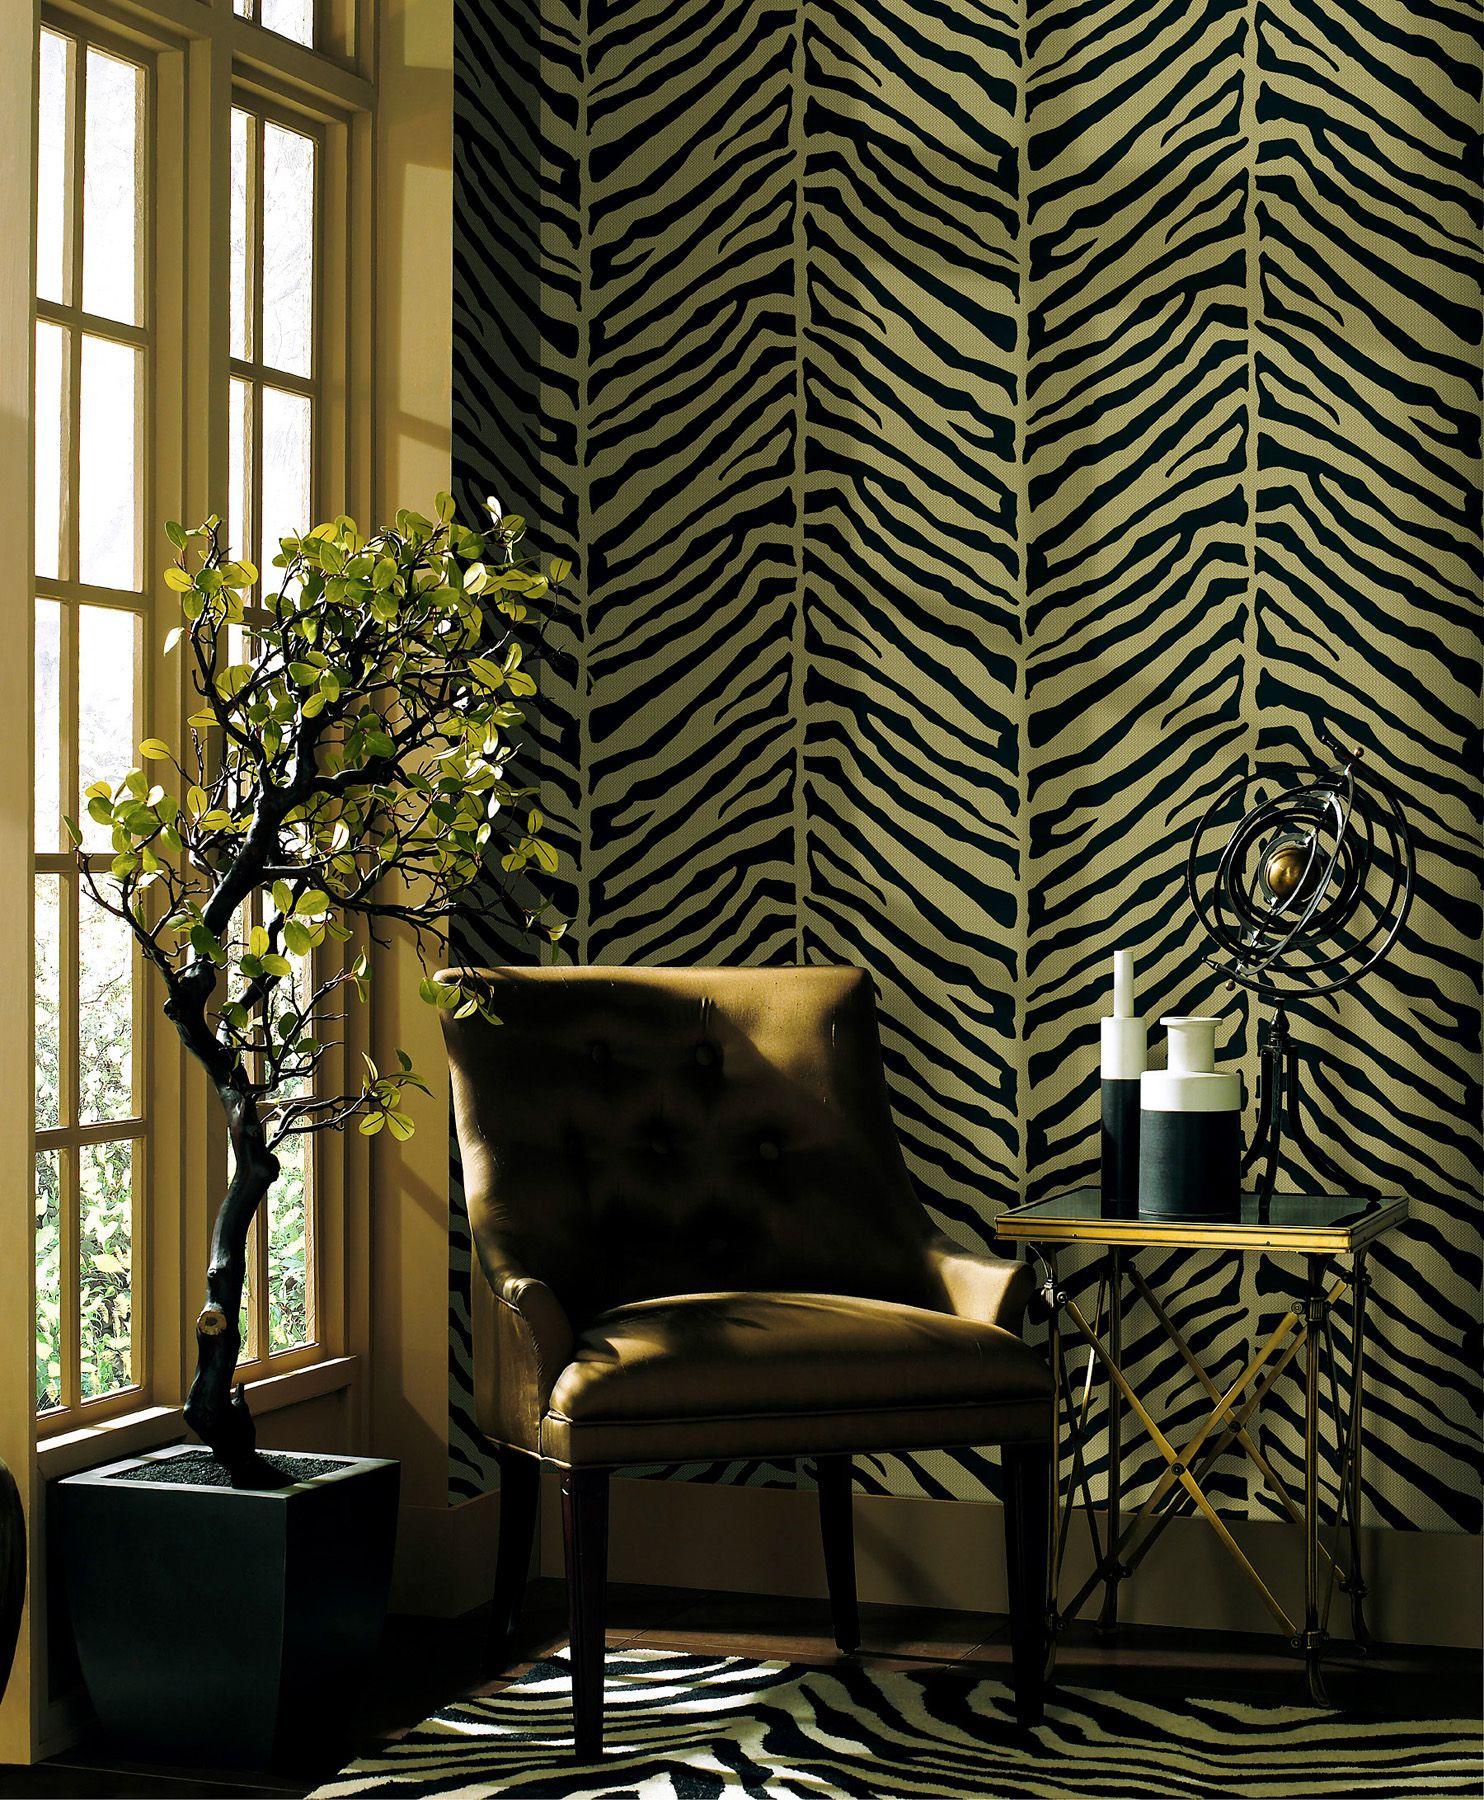 zebra print living room wallpaper feature wall | Zebra ...